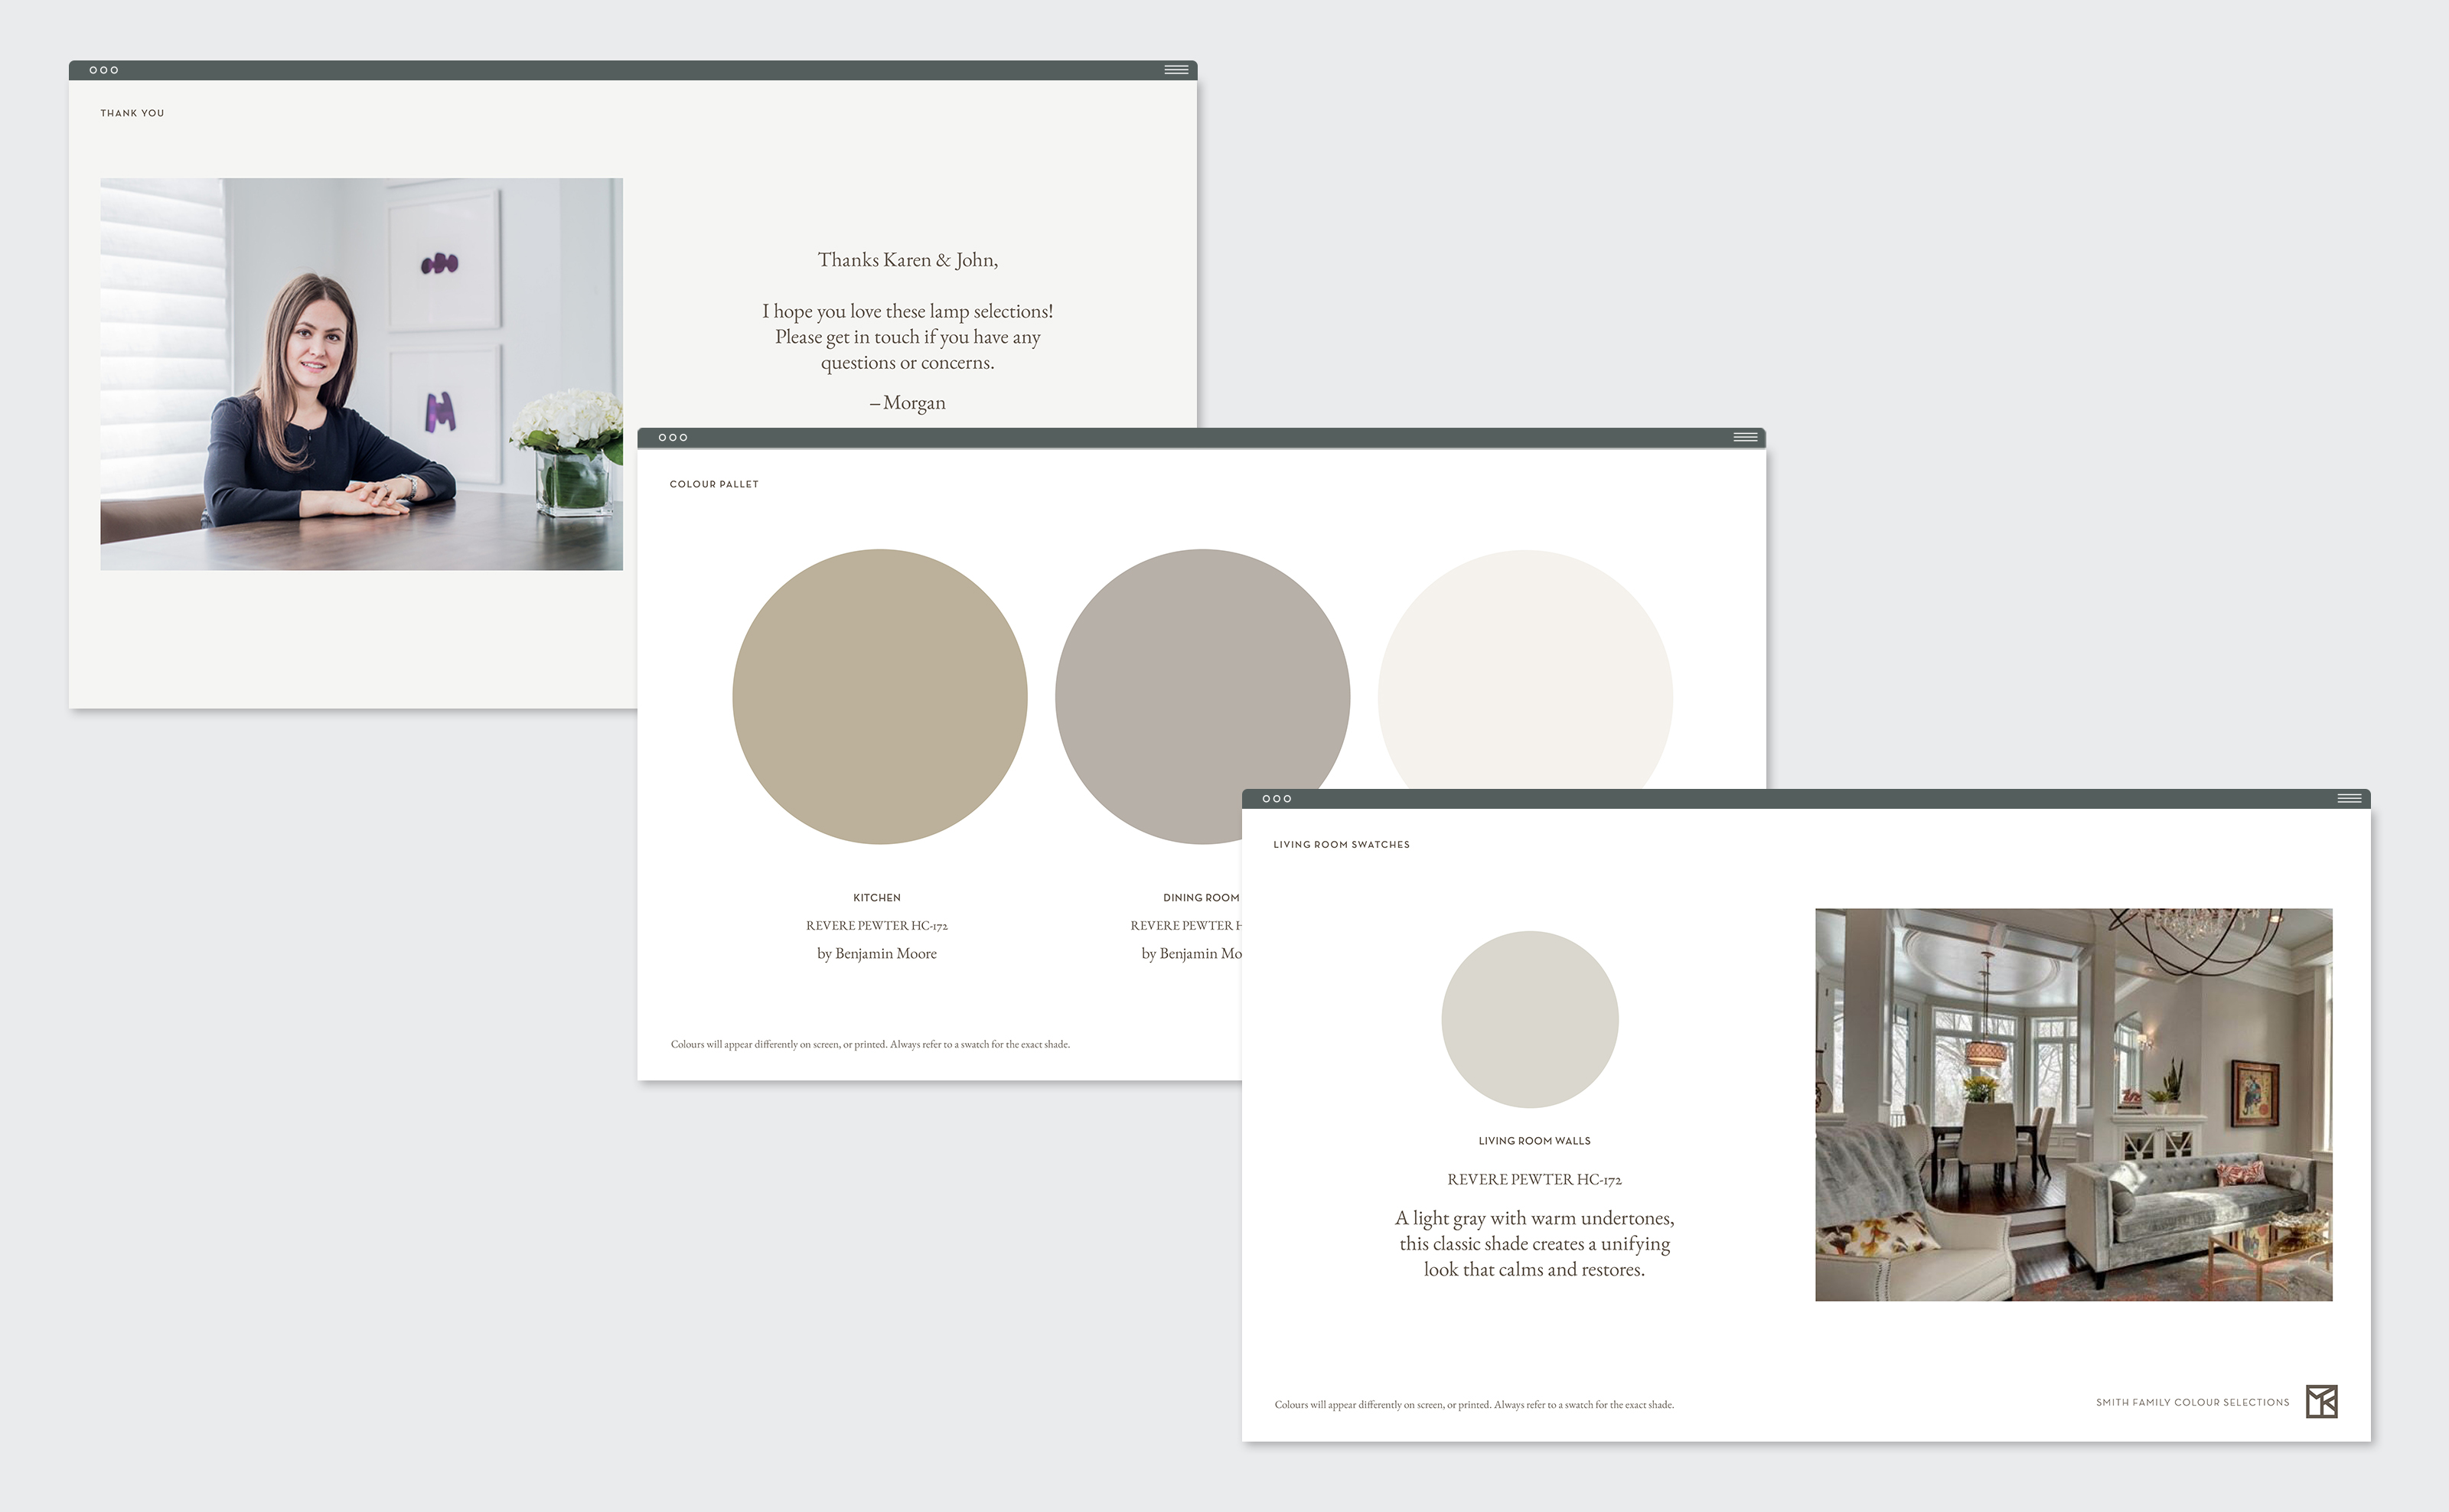 Morgan Kelly Interiors presentation design pages